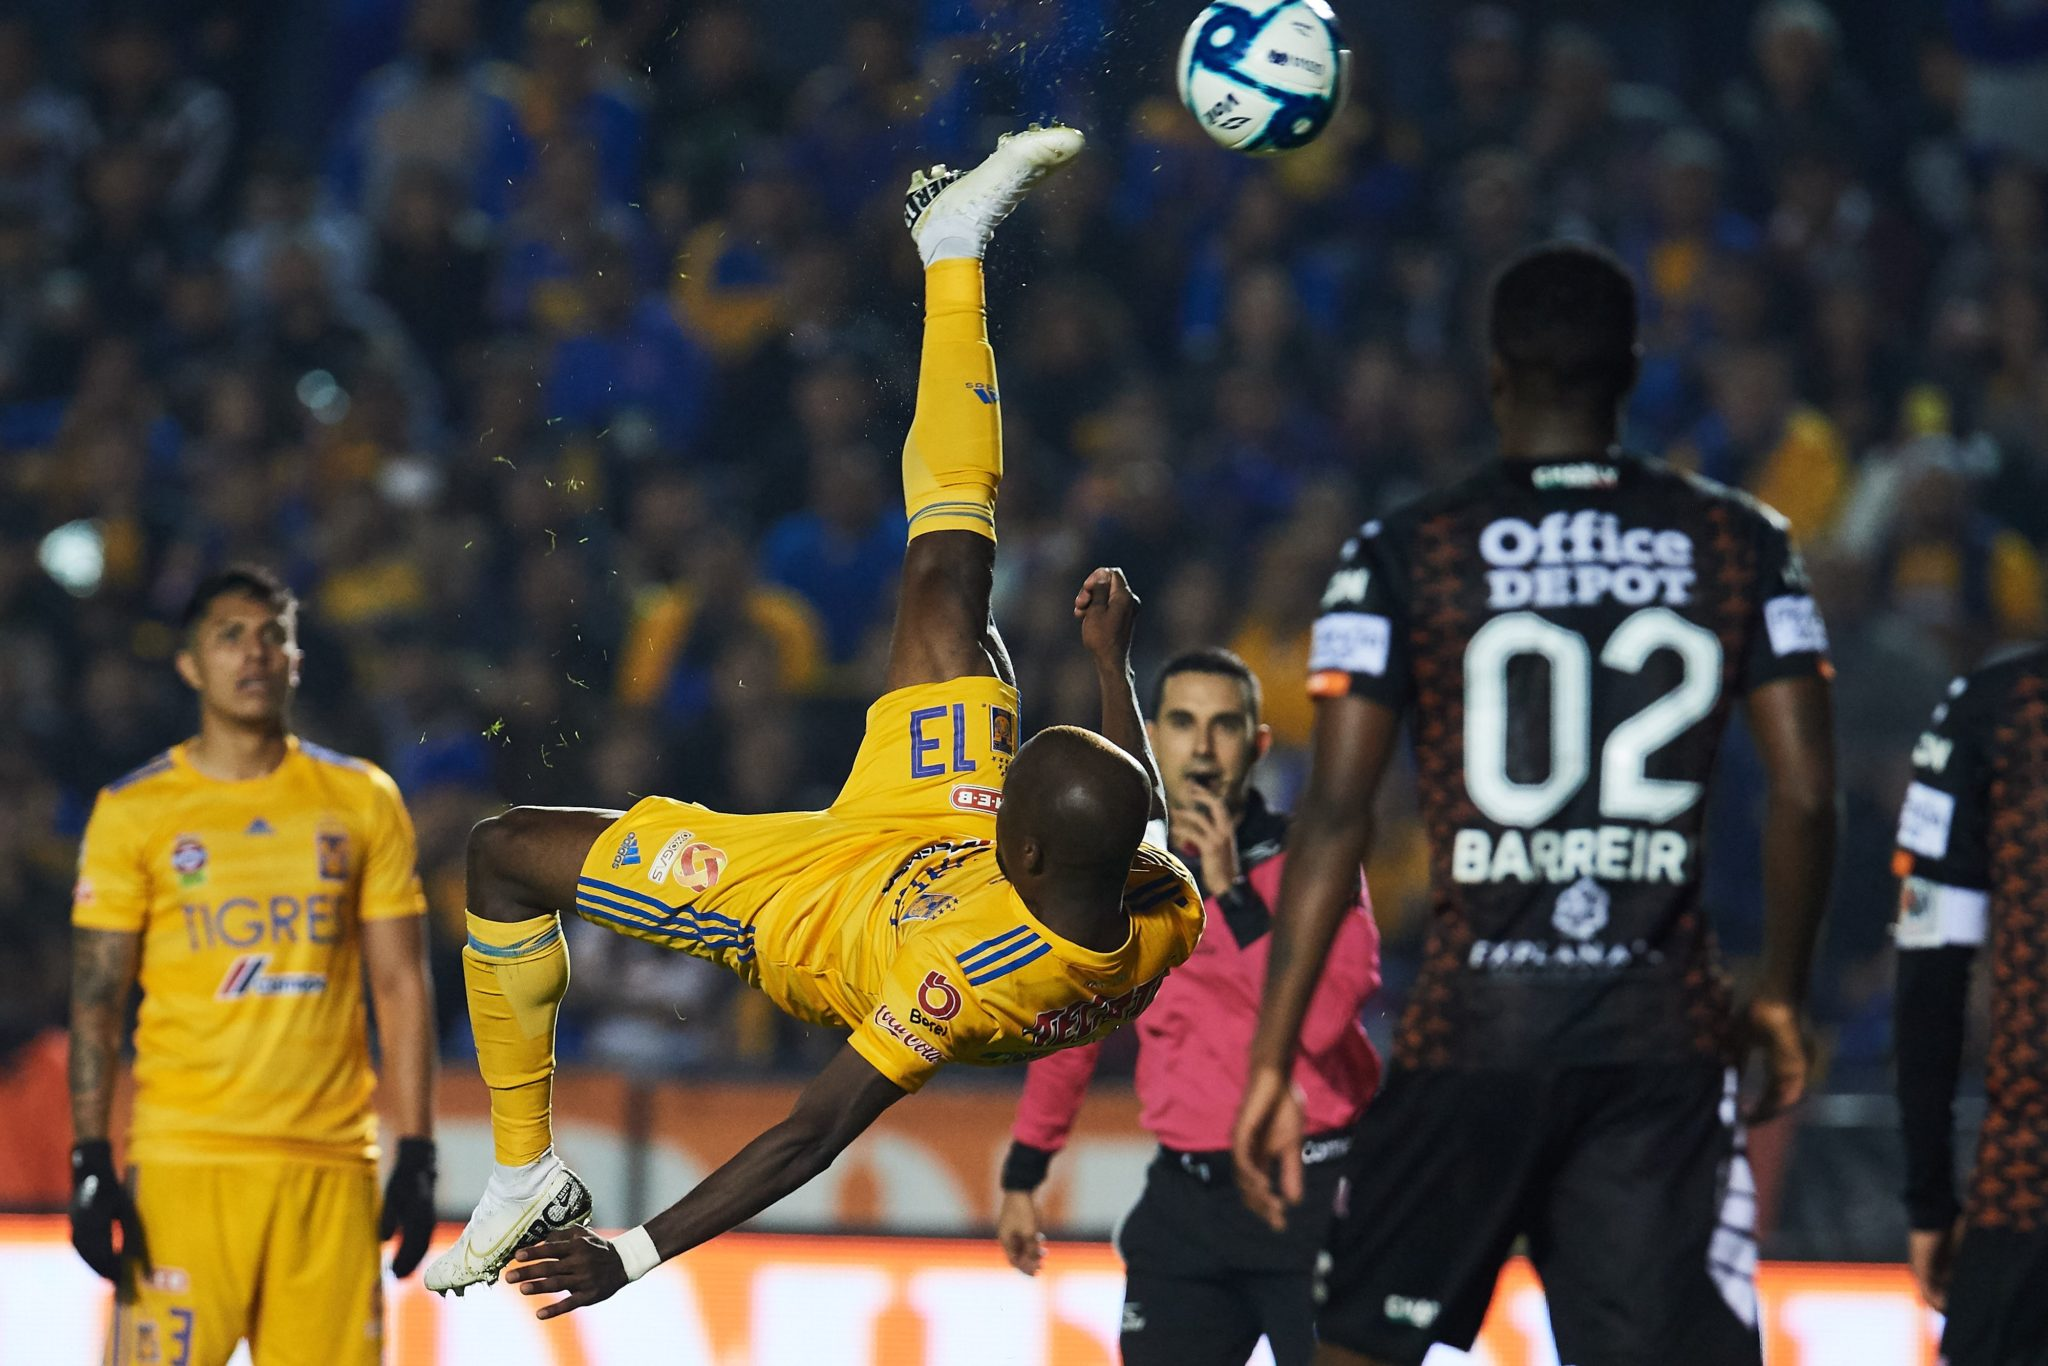 Pachuca empató con Tigres. Foto: Twitter